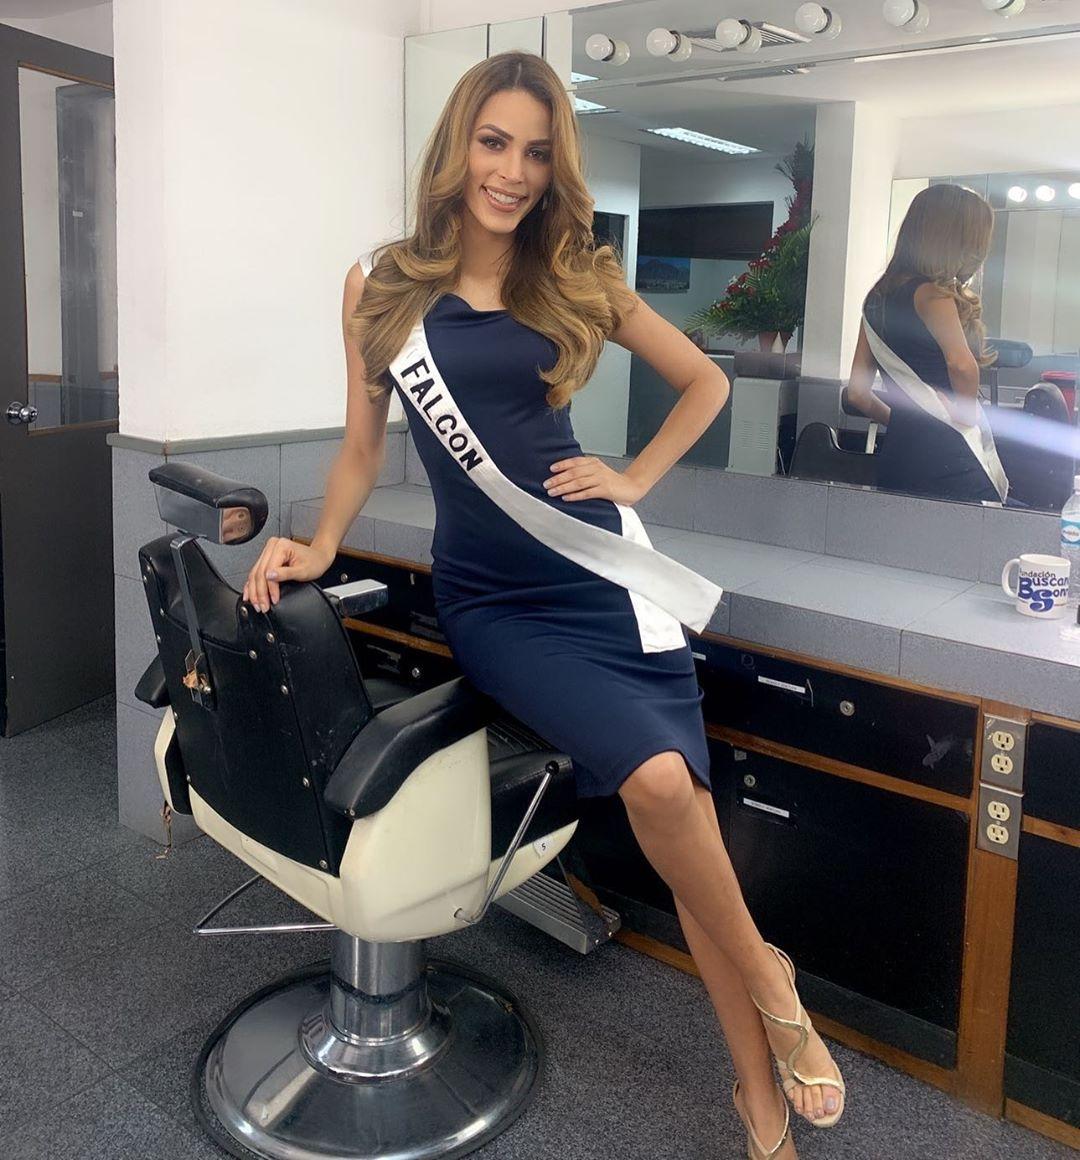 maria jose bracho, miss venezuela continentes unidos 2019. - Página 2 66200410